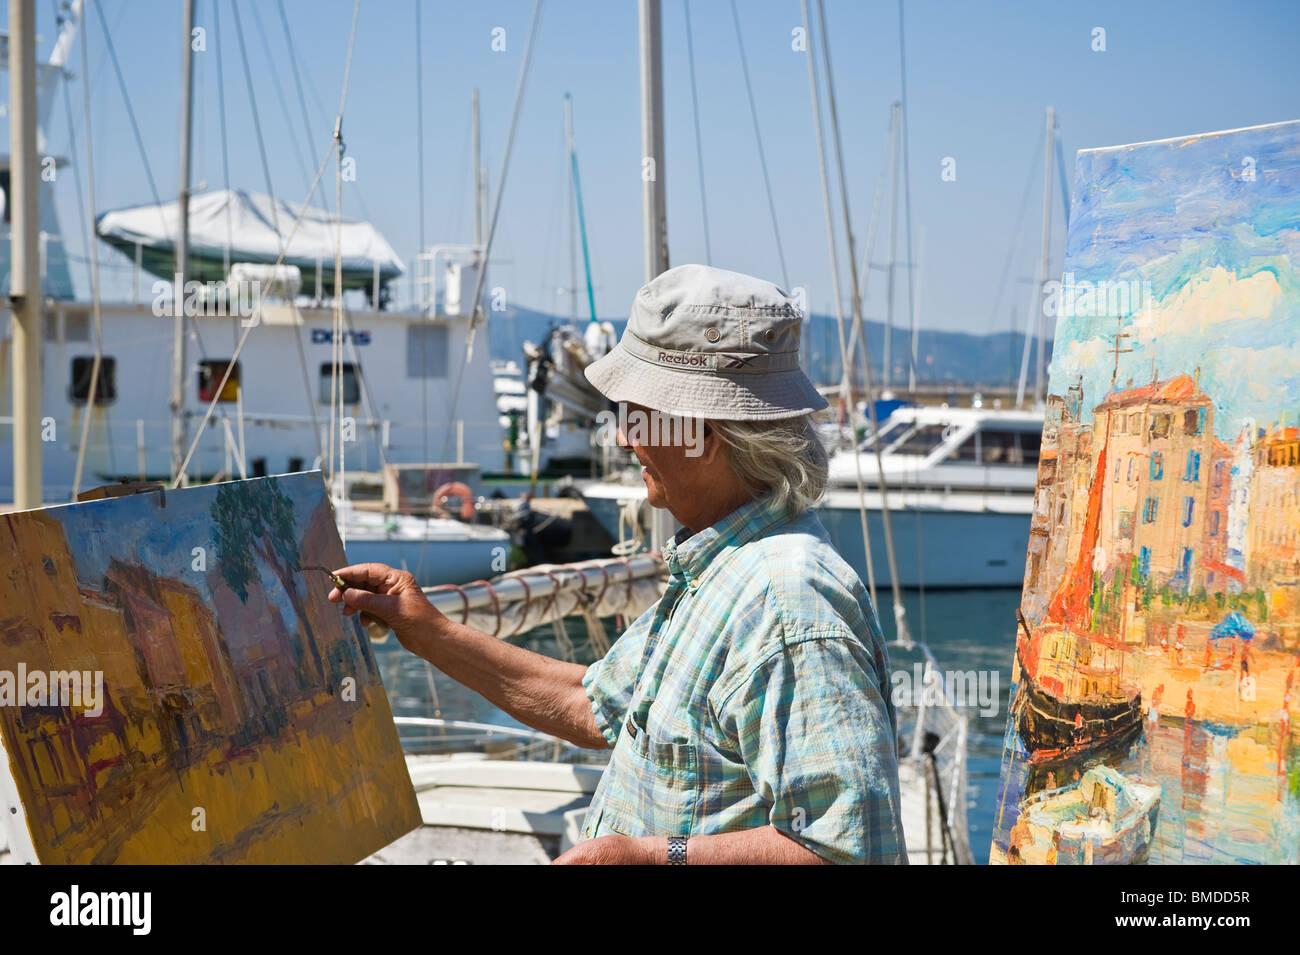 Artiste Peintre St Tropez street artist painting in harbor, saint tropez, france stock